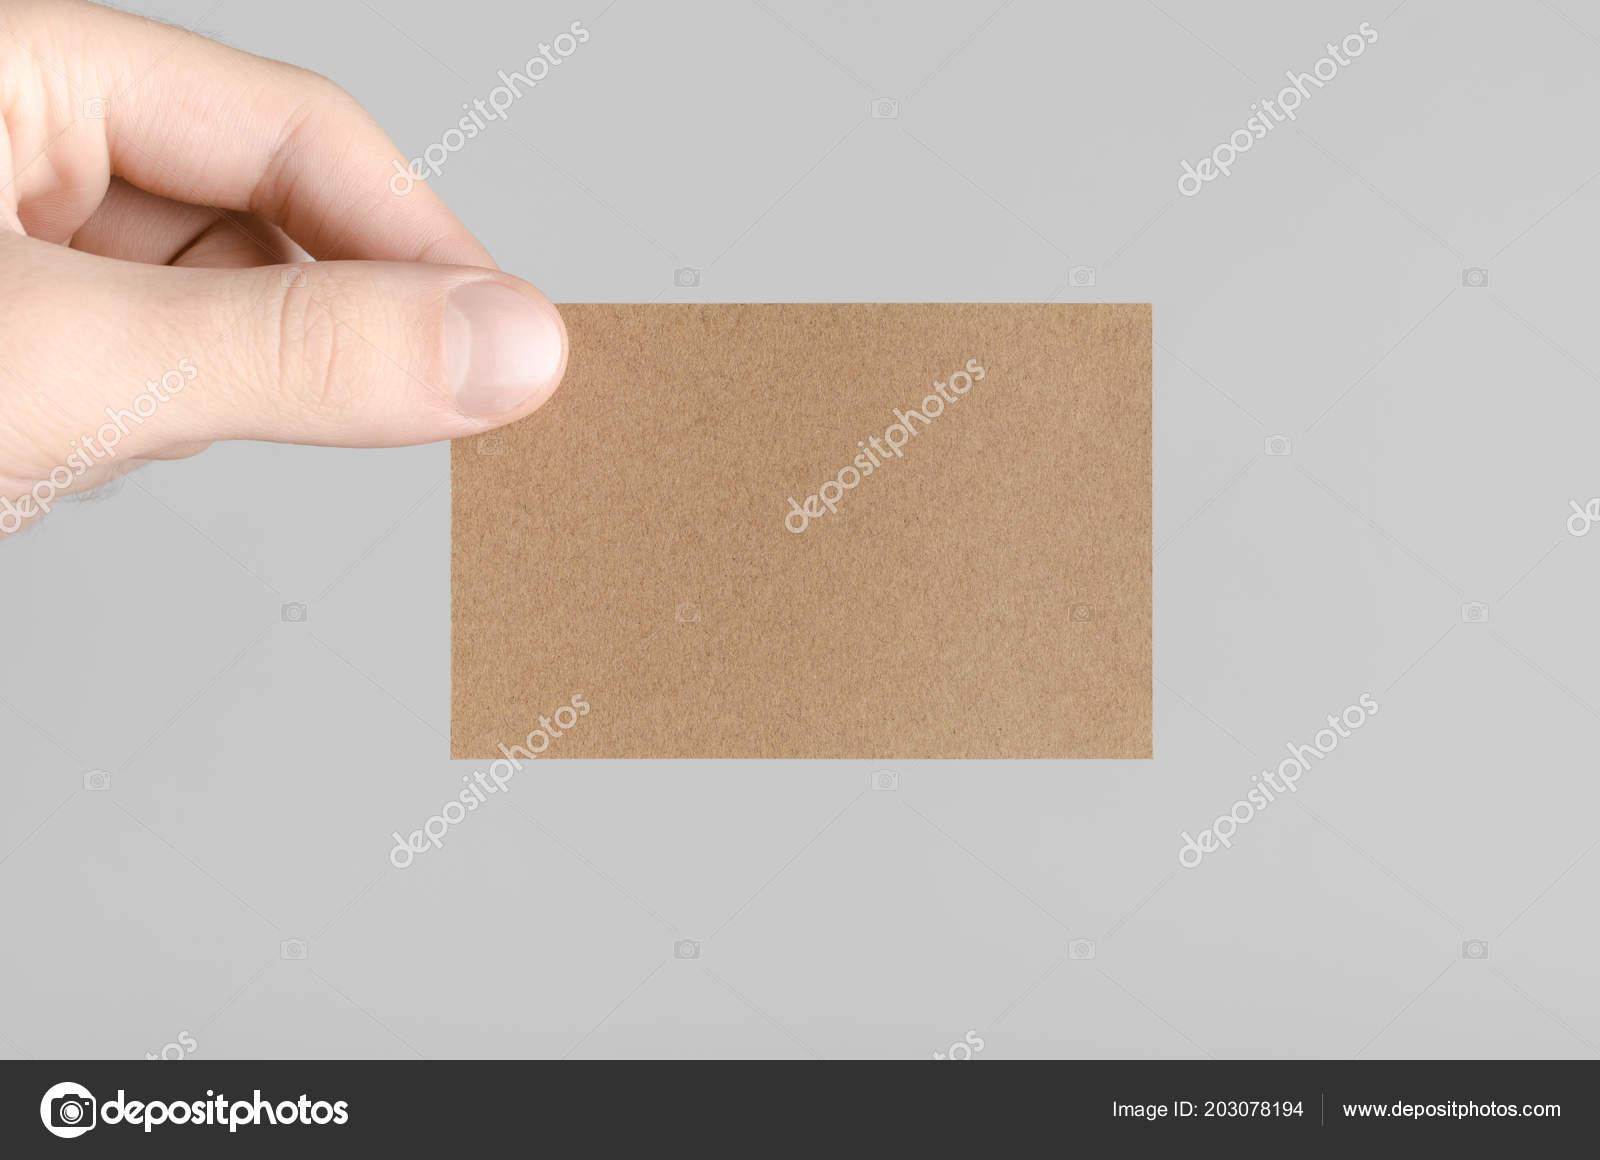 Kraft business card mock 85x55mm male hands holding kraft card kraft business card mock 85x55mm male hands holding kraft card fotografia de stock reheart Images